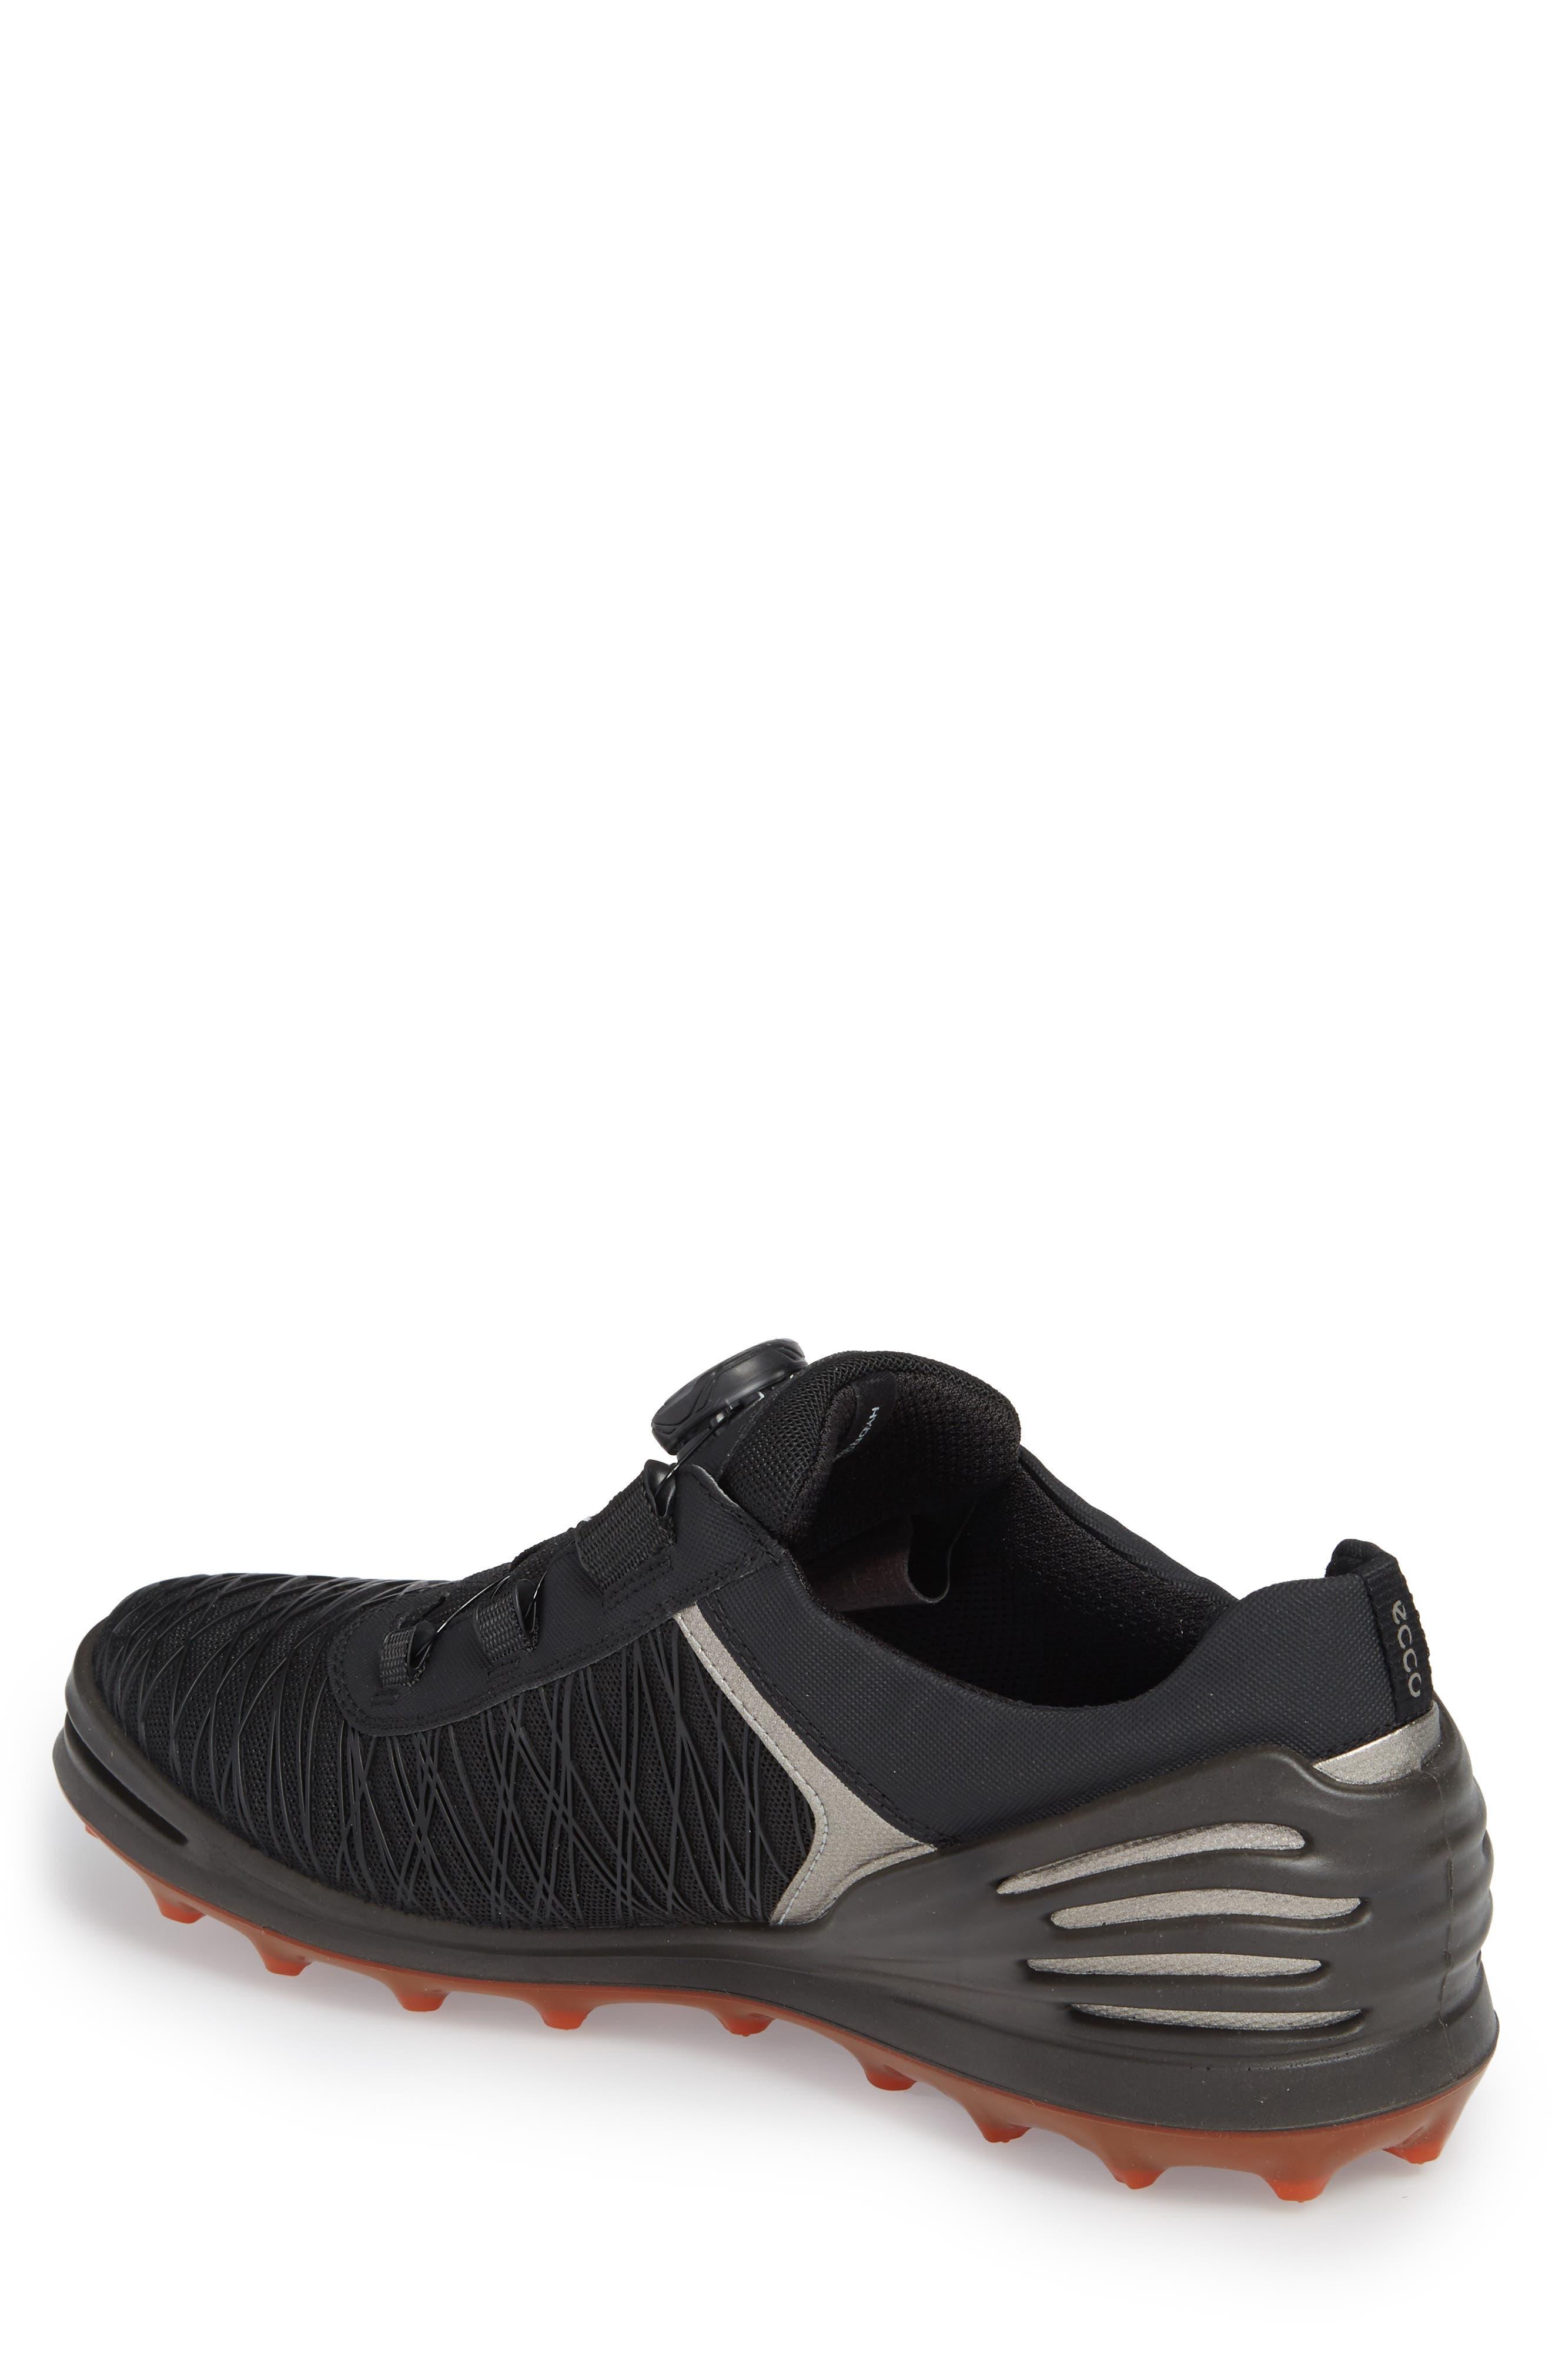 Cage Pro BOA Golf Shoe,                             Alternate thumbnail 2, color,                             Black